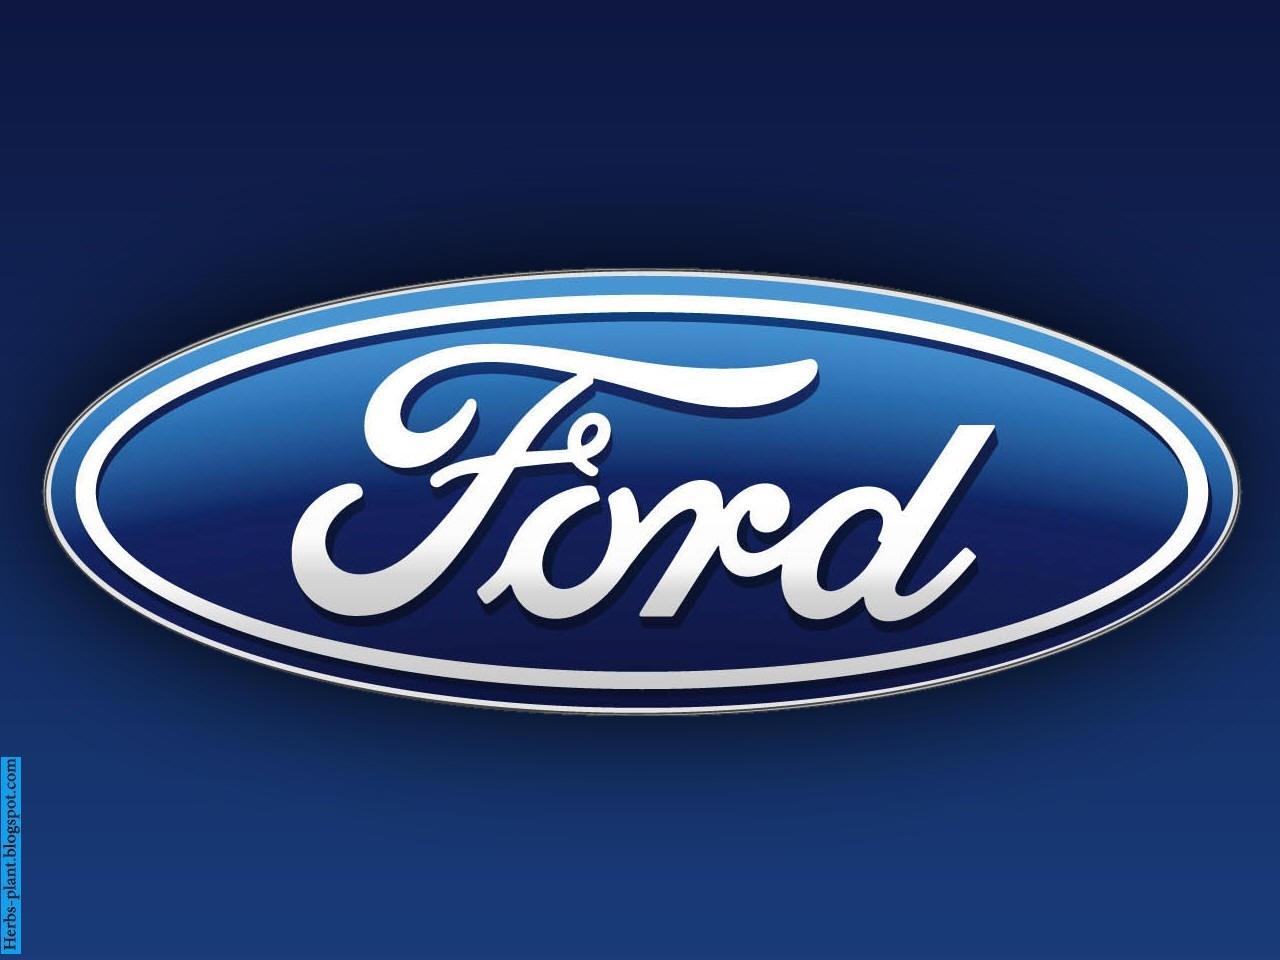 Ford mondeo car 2013 logo - صور شعار سيارة فورد مونديو 2013